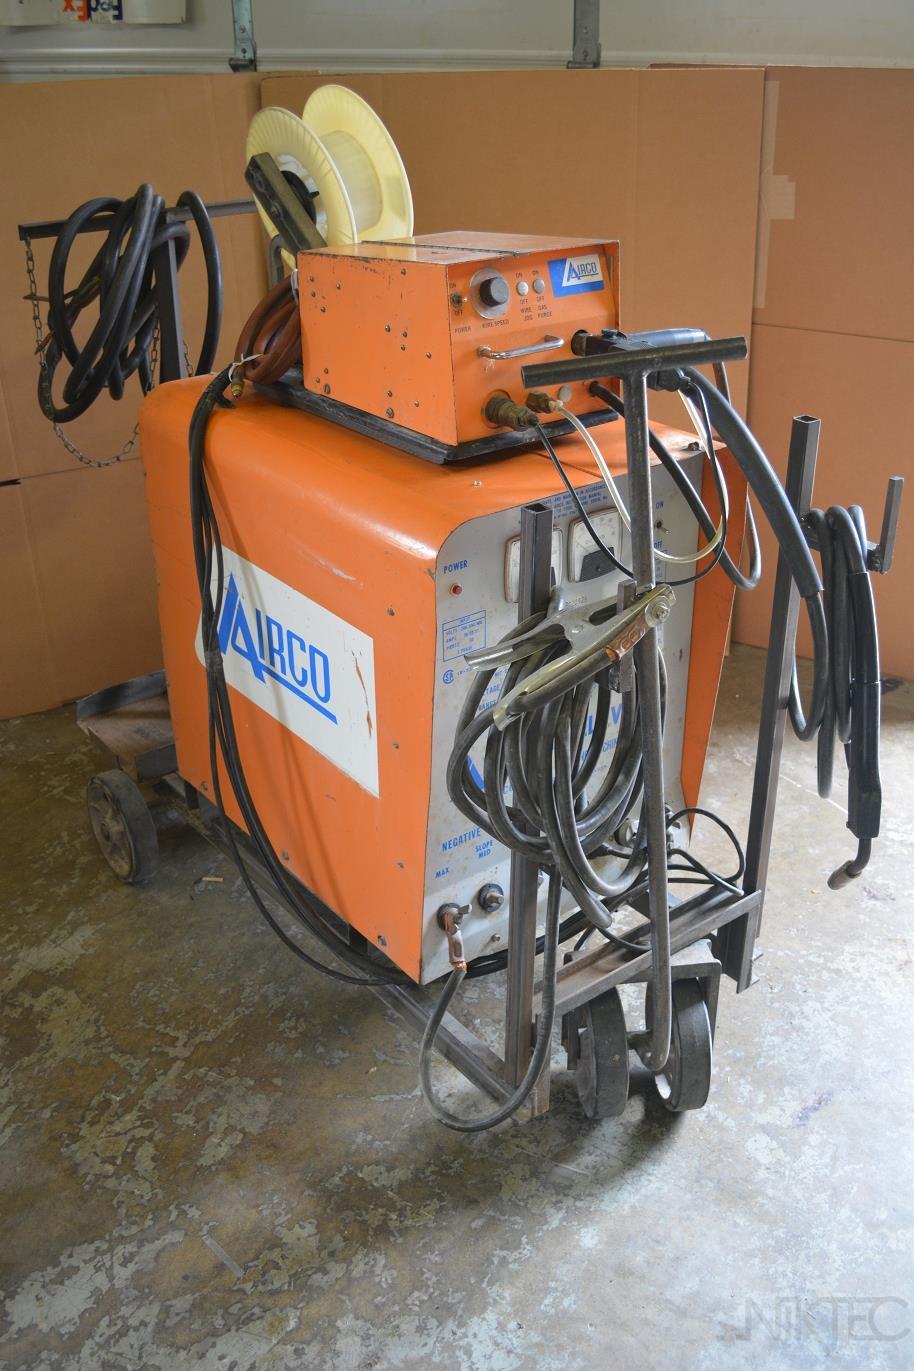 airco cv 300 welder 300amp mig welder wire feeder ebay. Black Bedroom Furniture Sets. Home Design Ideas